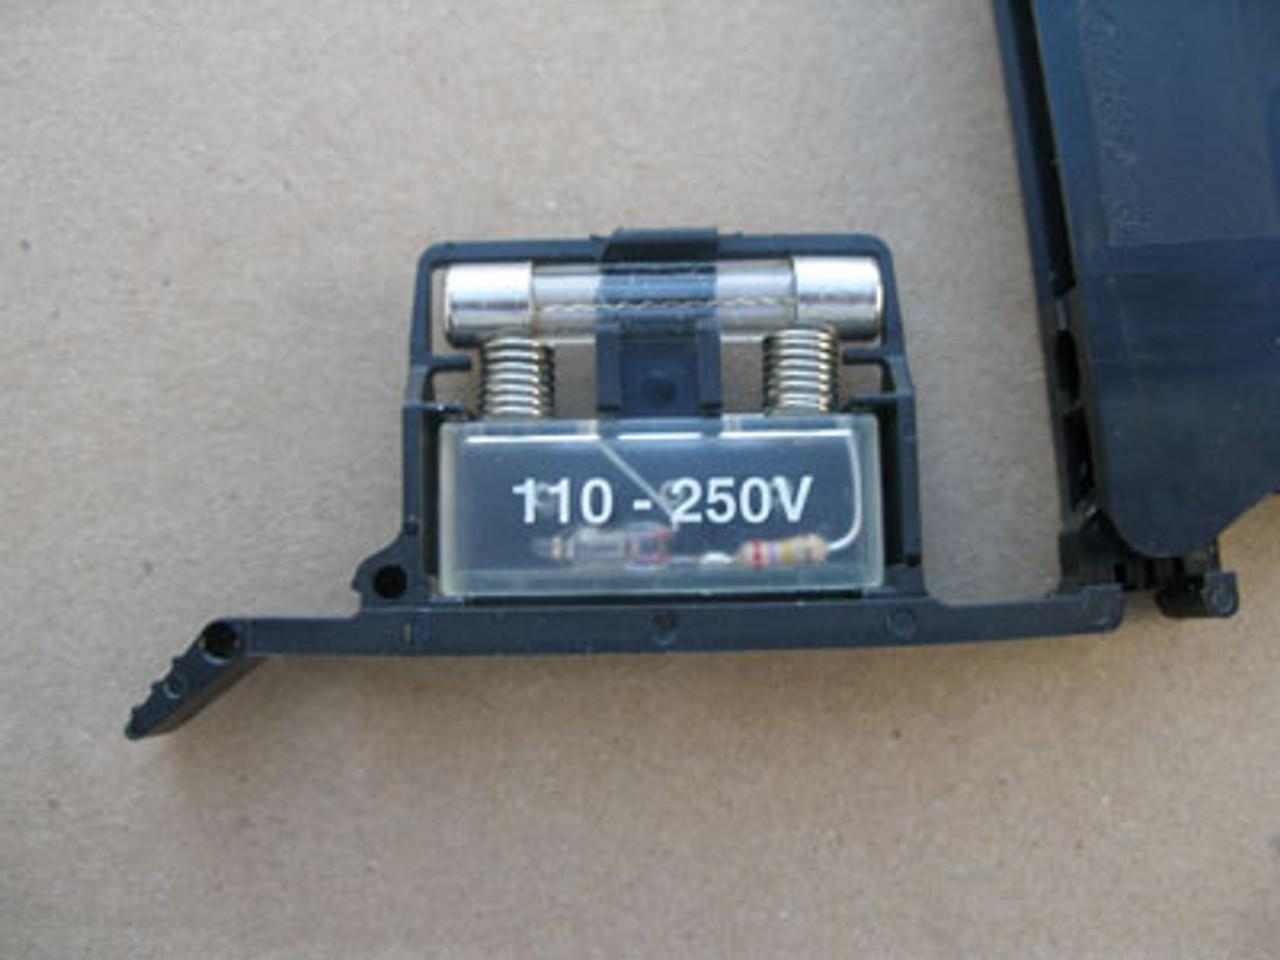 Phoenix Contact UK 6.3-HESI Fuse Term Blocks 110 - 250V (Lot of 5)